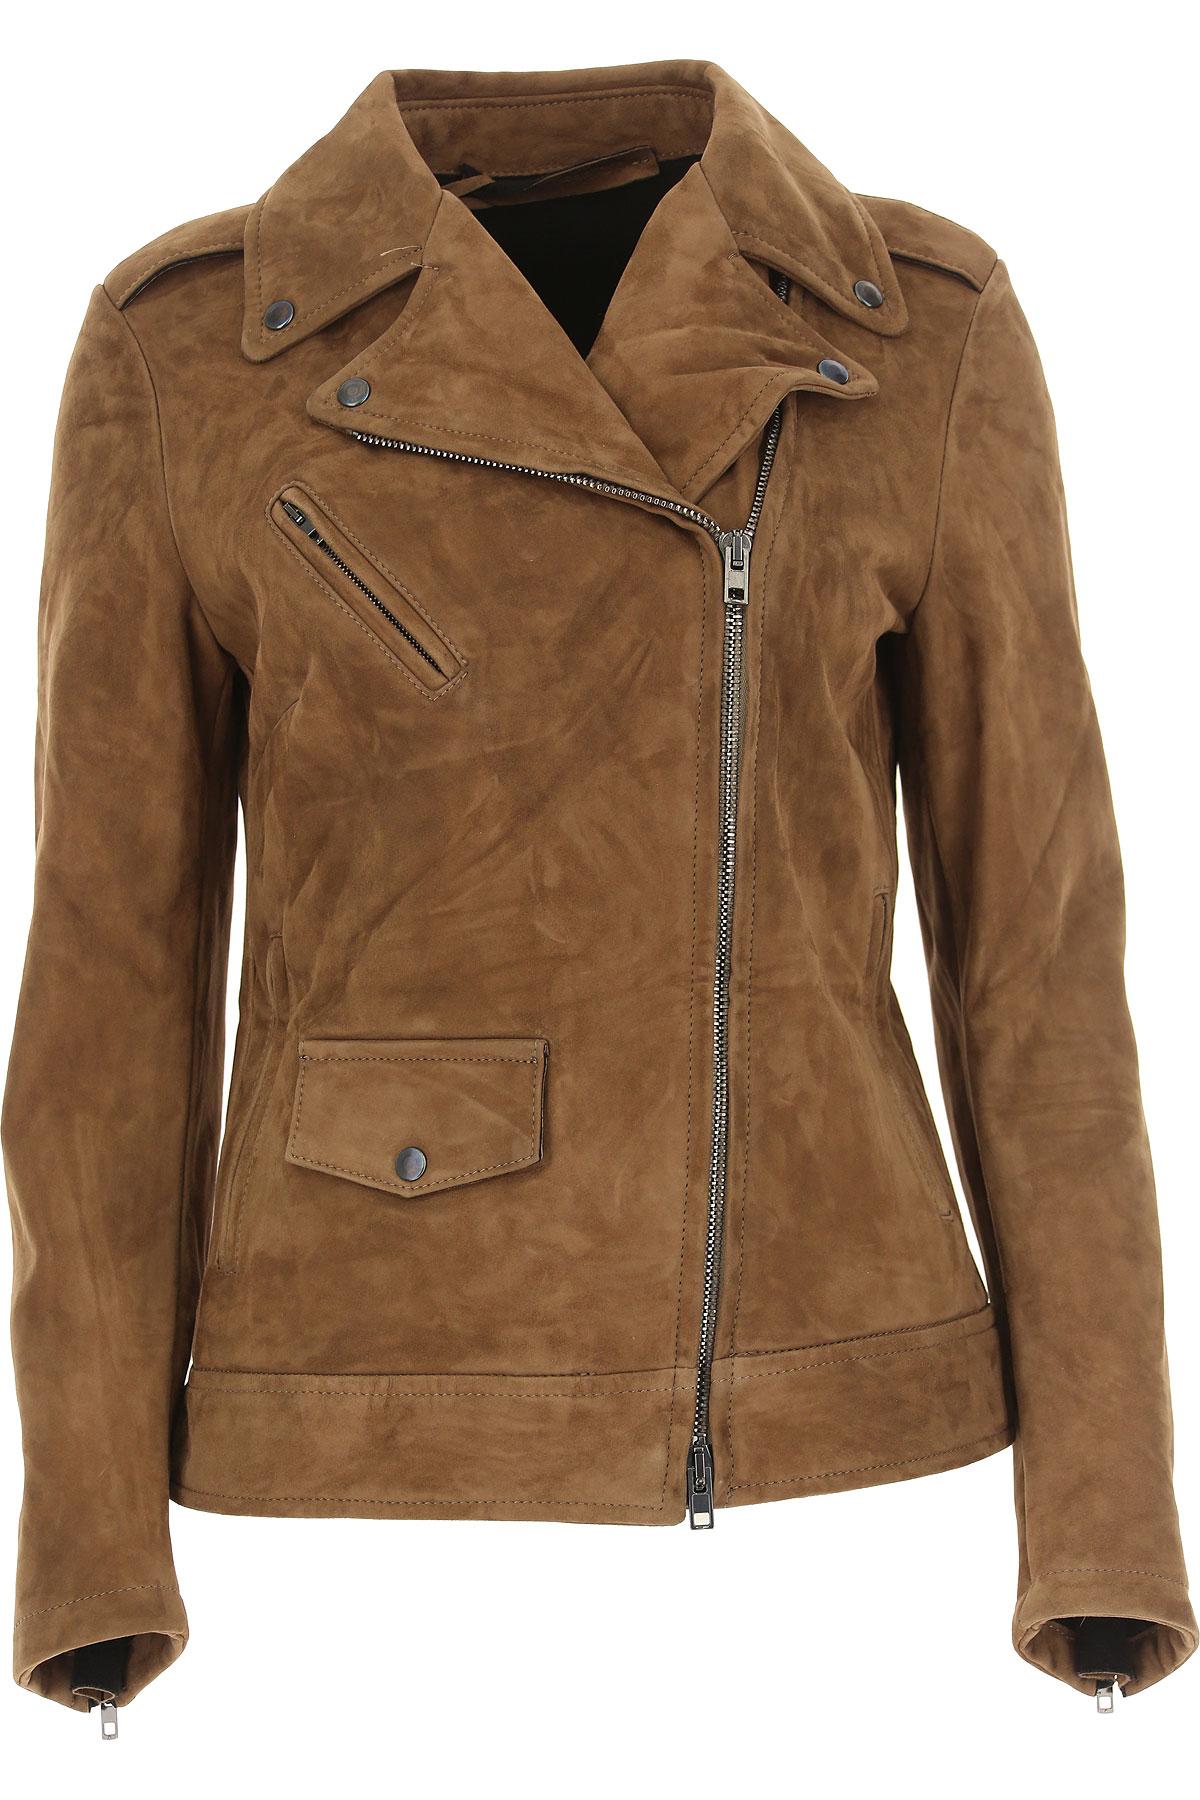 Image of Salvatore Santoro Leather Jacket for Women, Biscuit, Leather, 2017, UK 10 - US 8 - EU 42 UK 12 - US 10 - EU 44